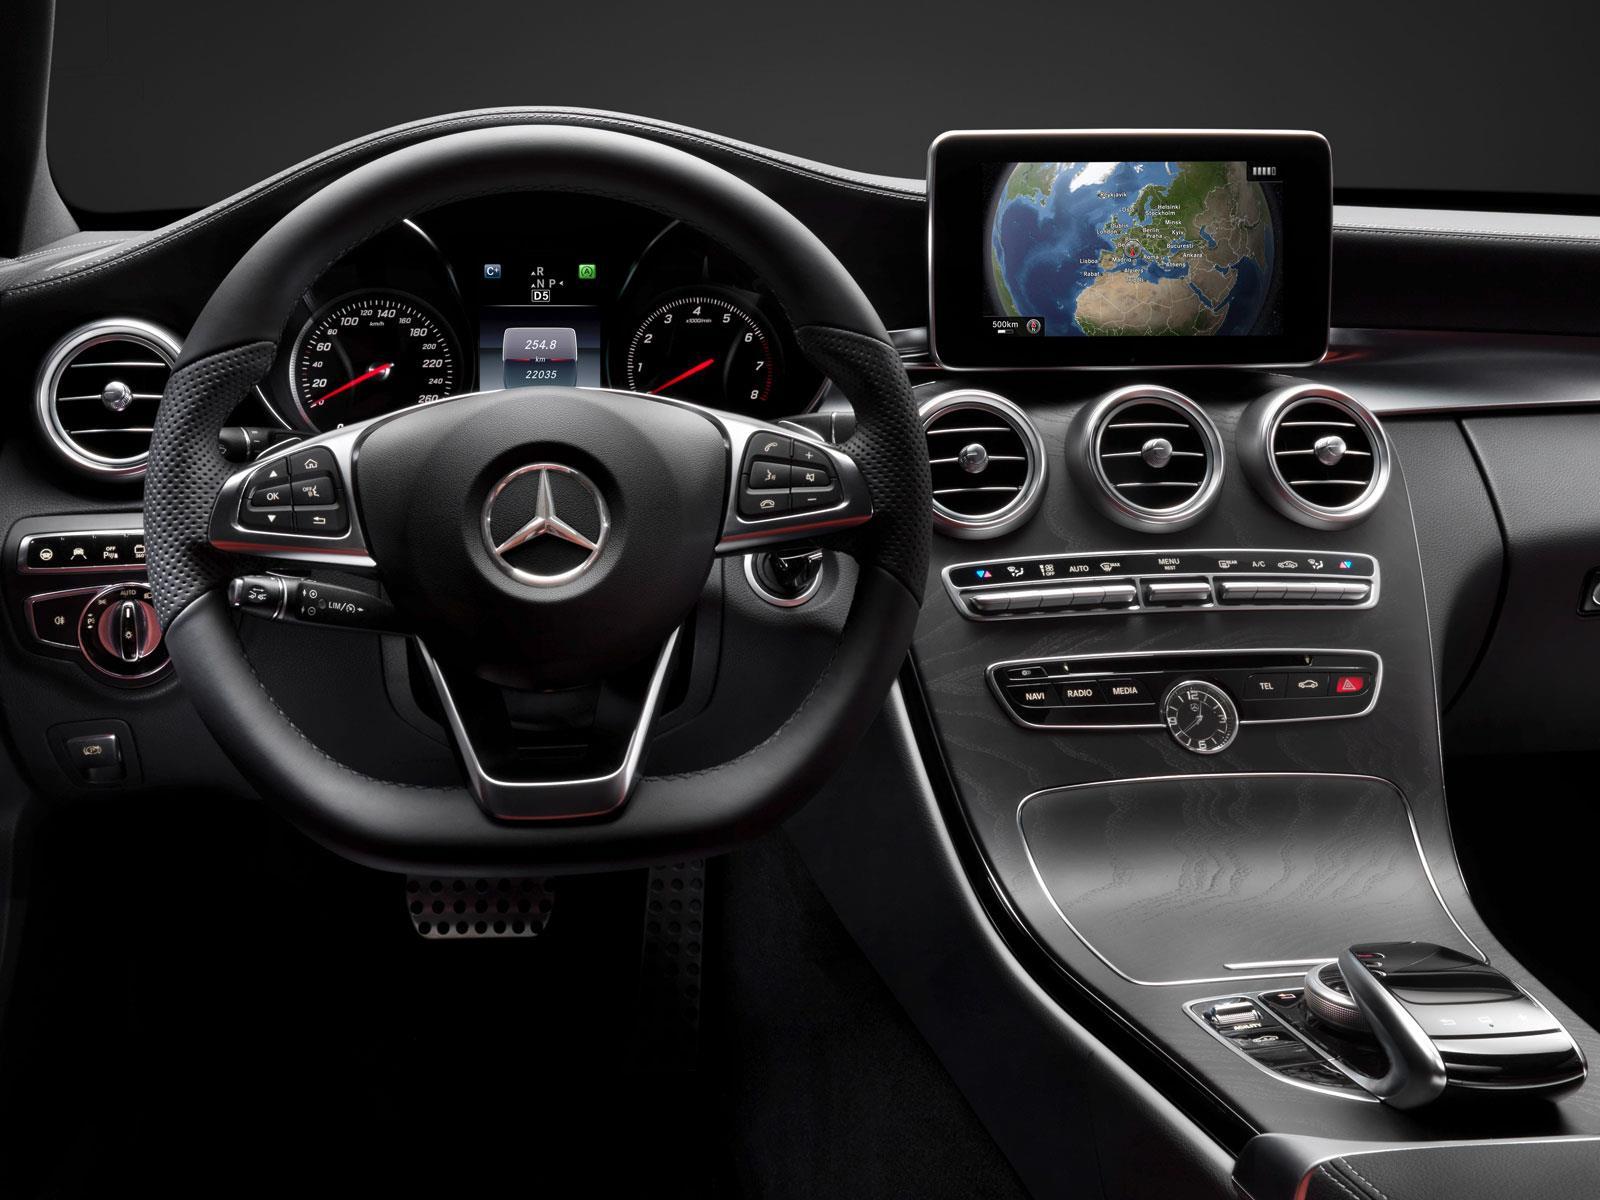 Mercedes benz clase c 2015 primeras im genes del interior for Interior mercedes clase a